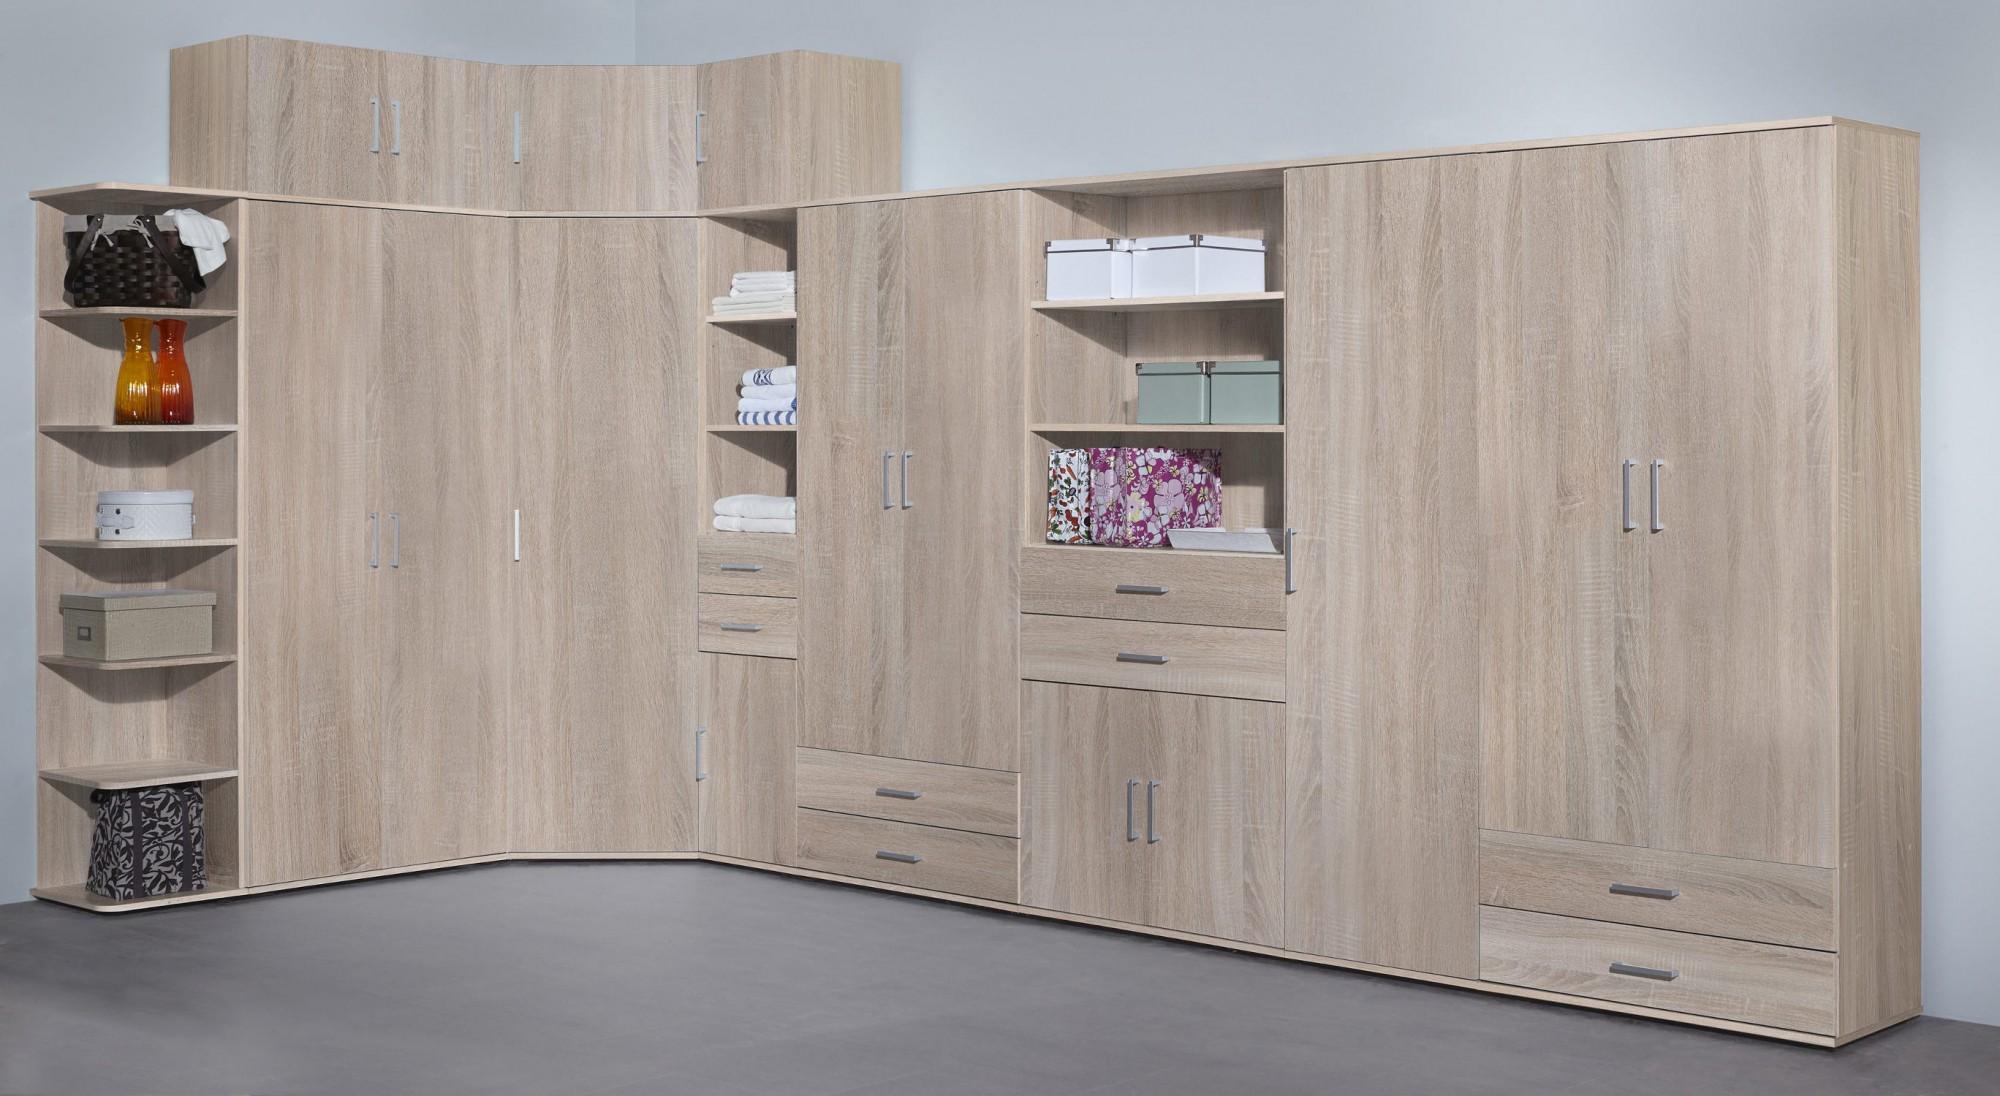 staubsaugerschrank ronny mehrzweckschrank system 2. Black Bedroom Furniture Sets. Home Design Ideas